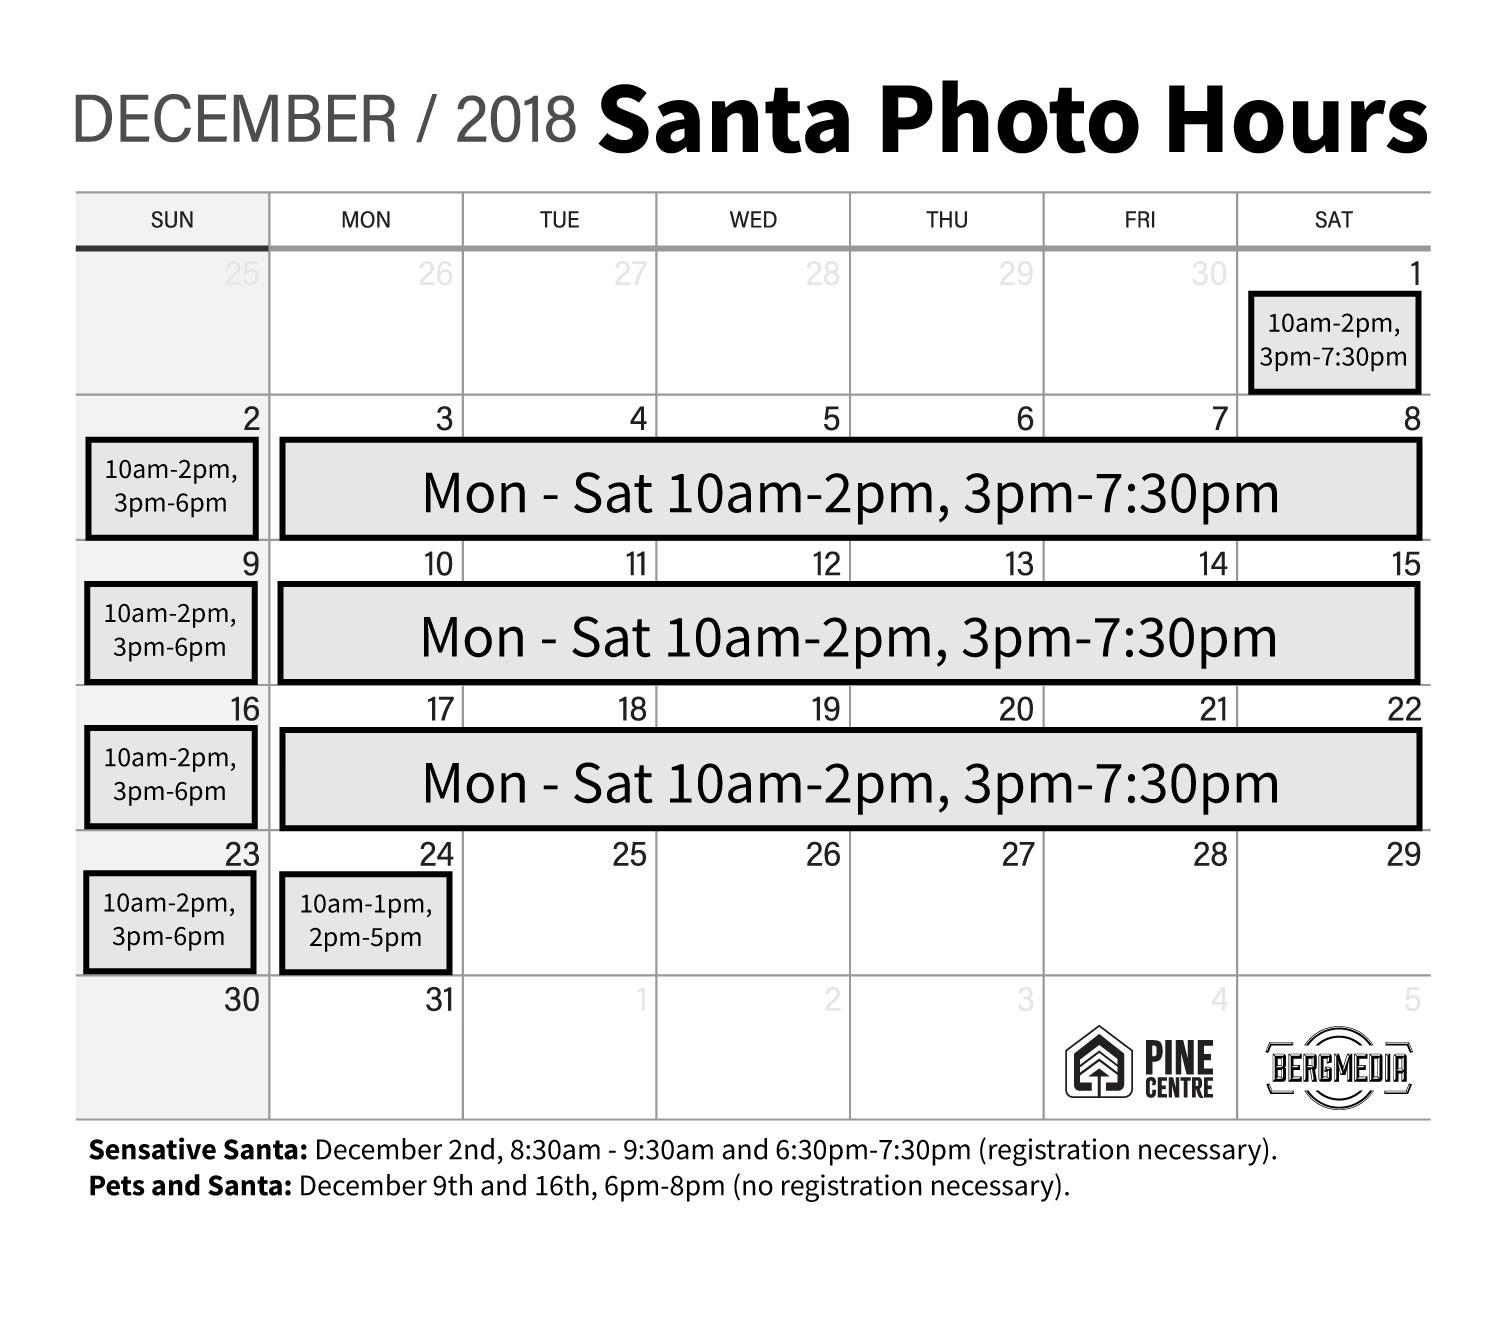 SANTA-HOURS-2018-DEC-CALENDAR.jpg